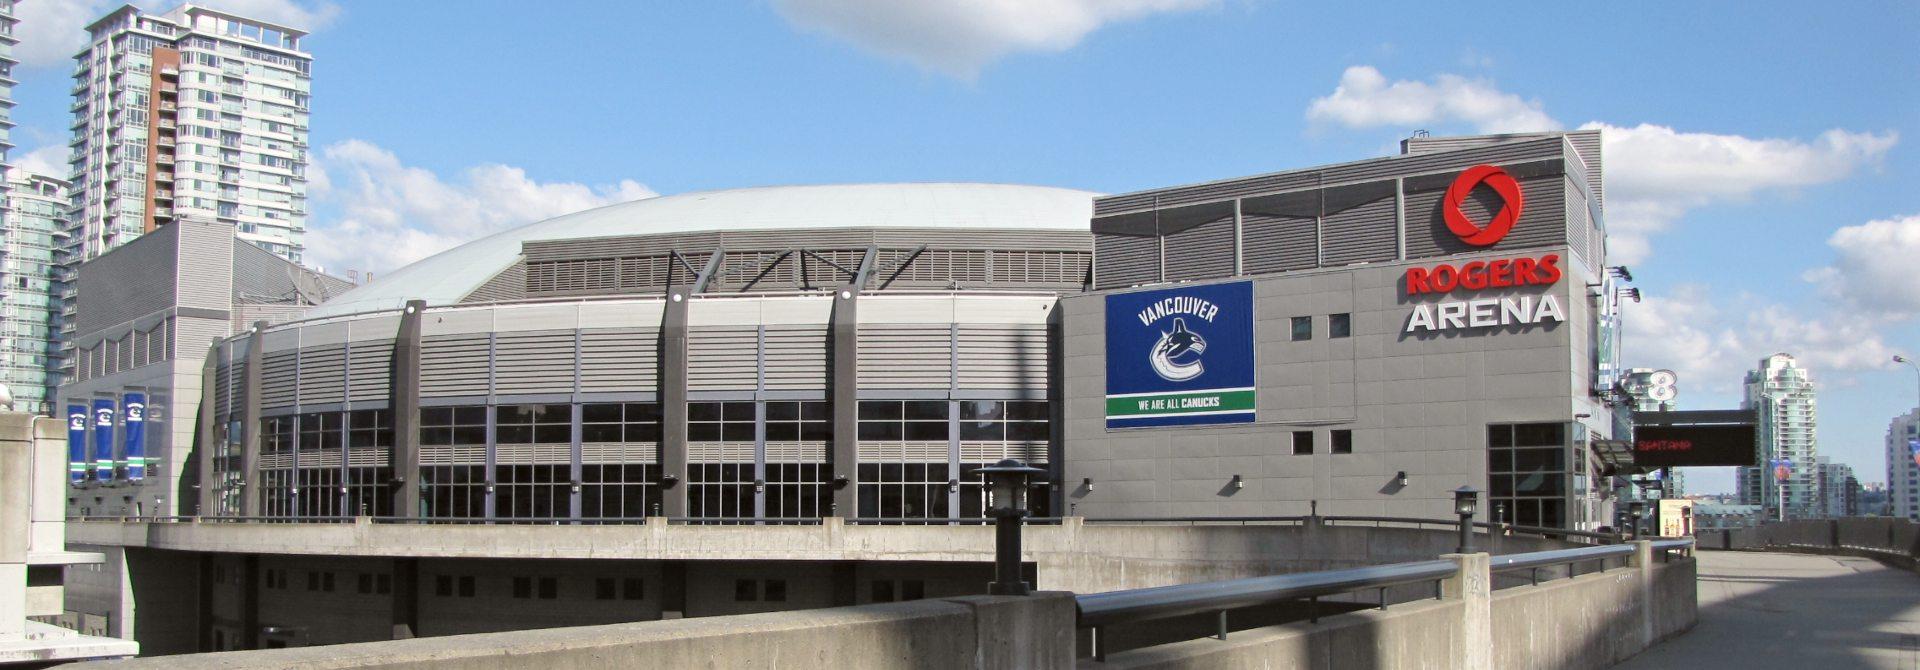 Rogers Arena Header